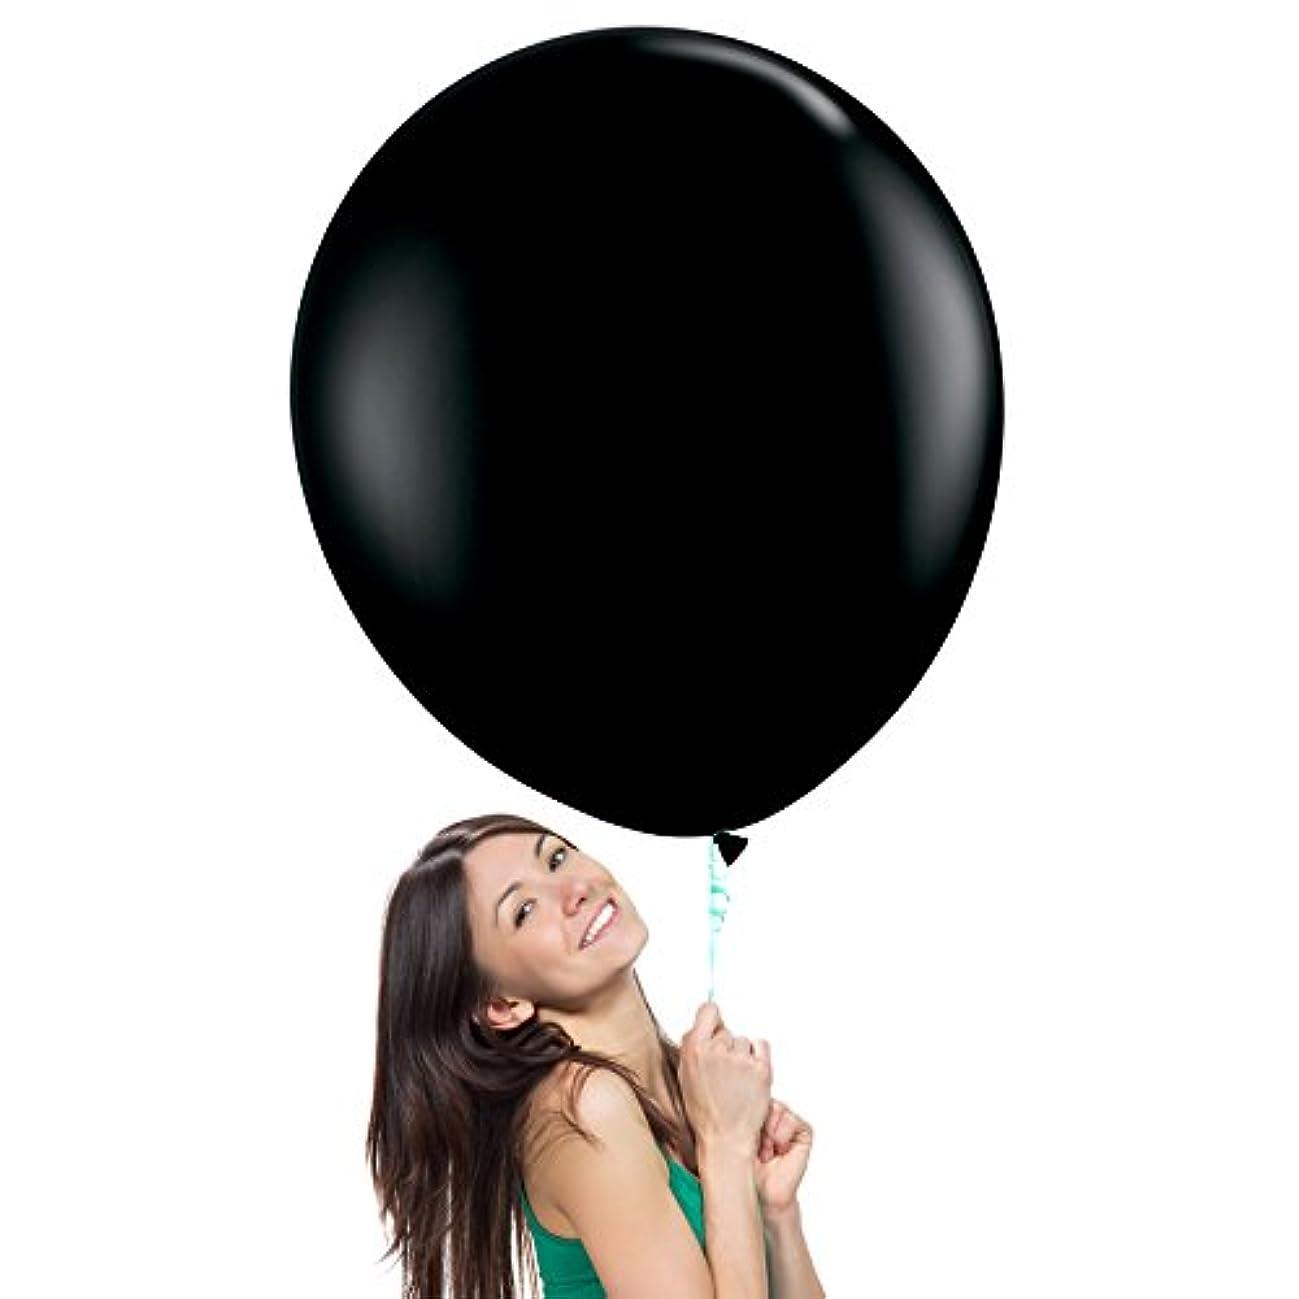 36 Inch Giant Jumbo Latex Balloons (Premium Helium Quality), Pack of 3, Regular Shape - Onyx Black